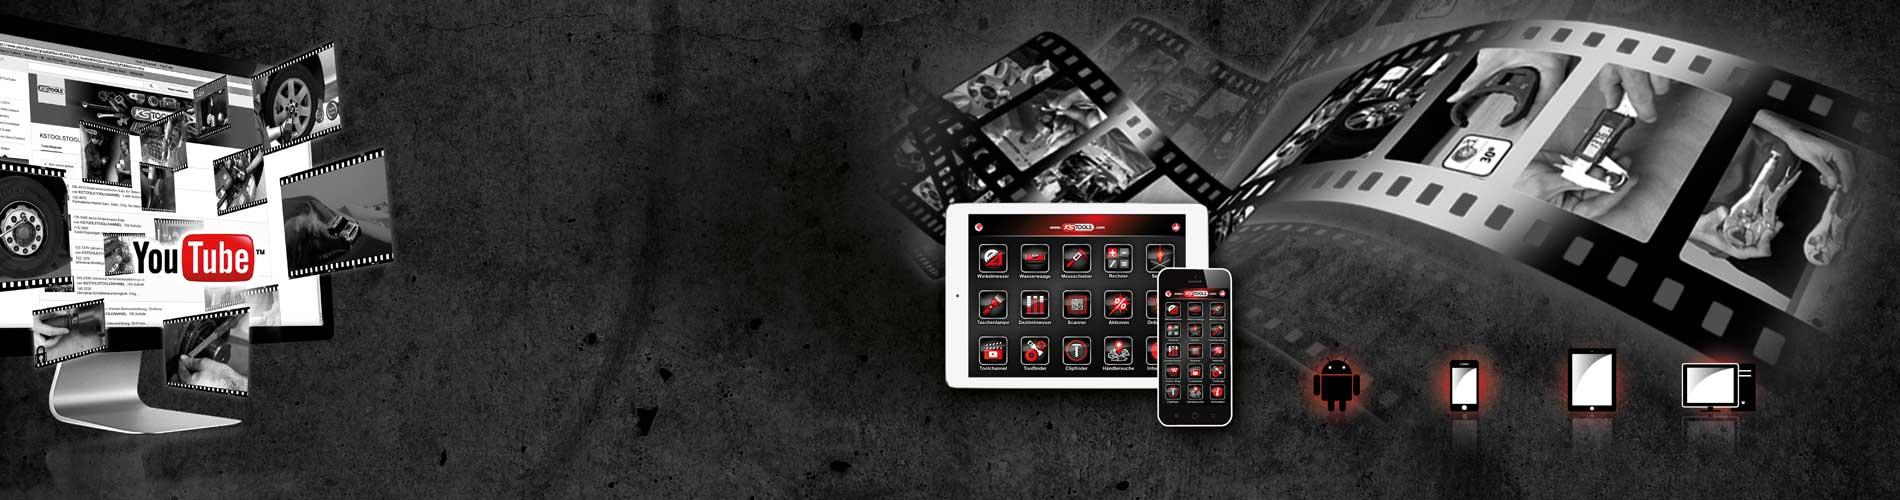 app | media | service | ks tools werkzeuge - maschinen gmbh